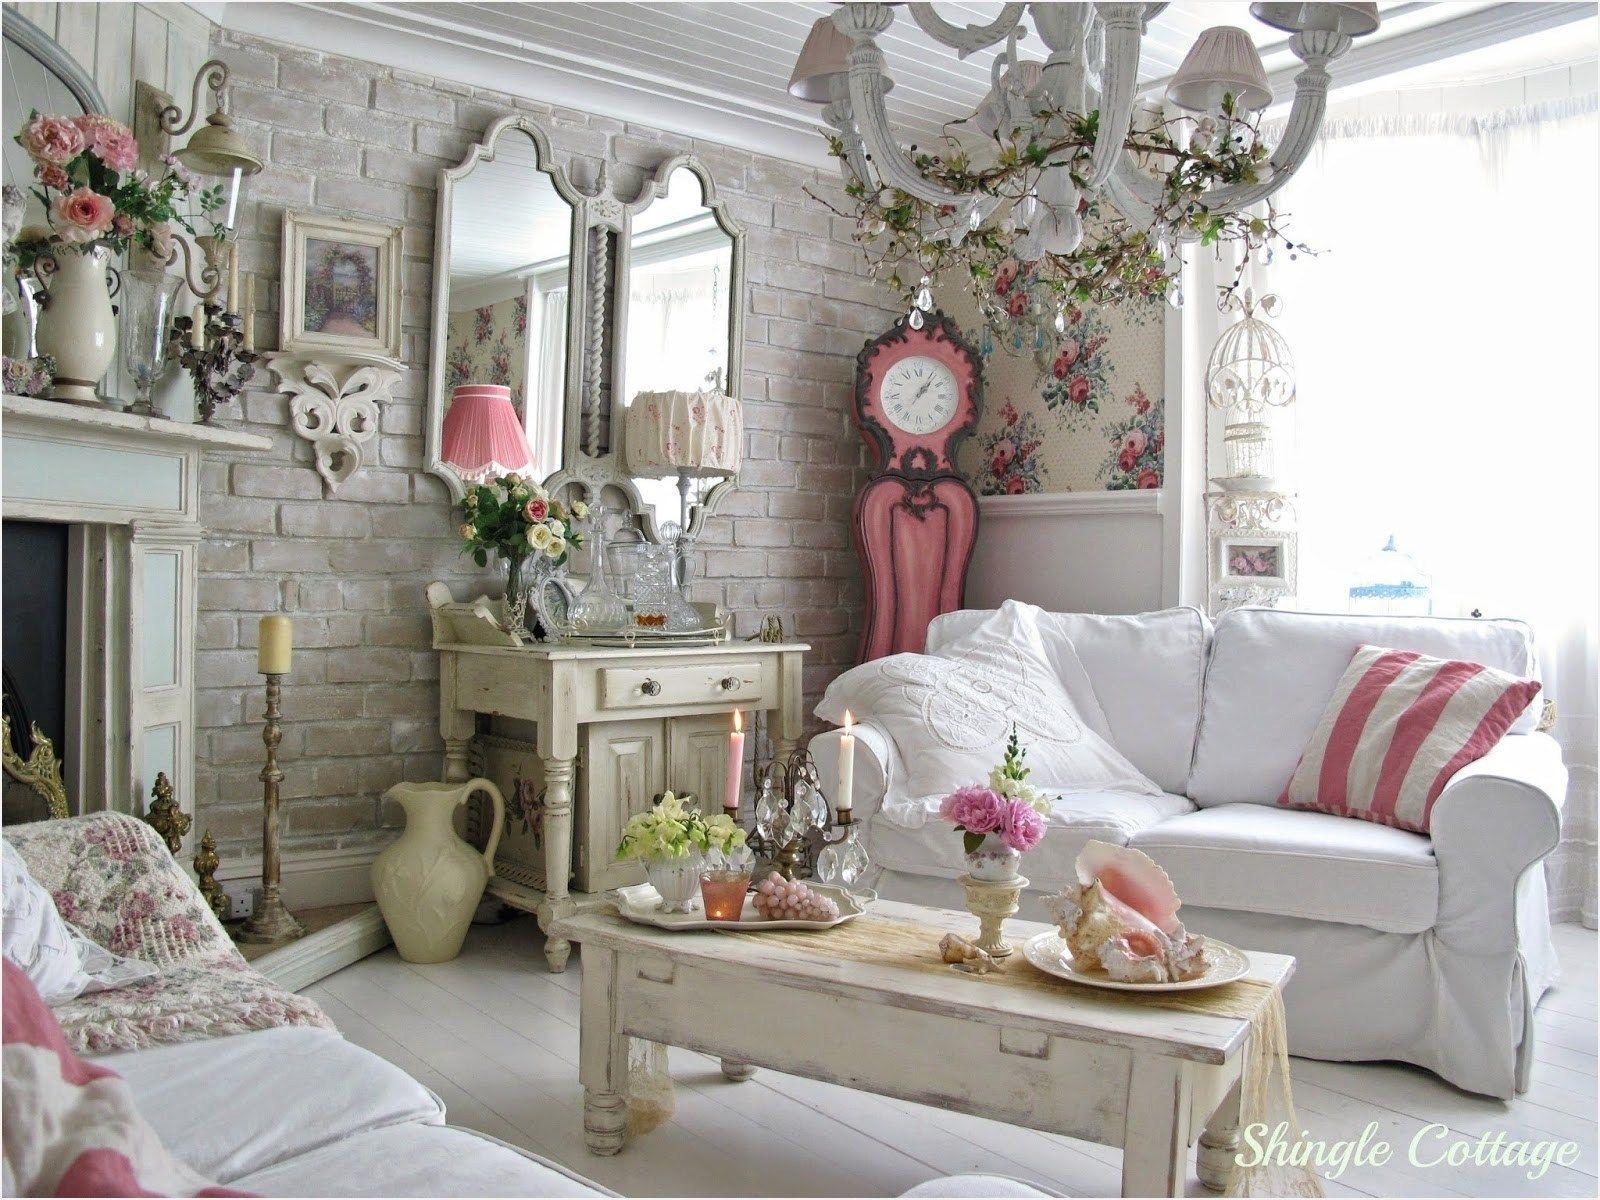 Romantic Cottage Living Room Homenthusiastic Chic Living Room Shabby Chic Living Room Shabby Chic Living Decorating cottage living rooms